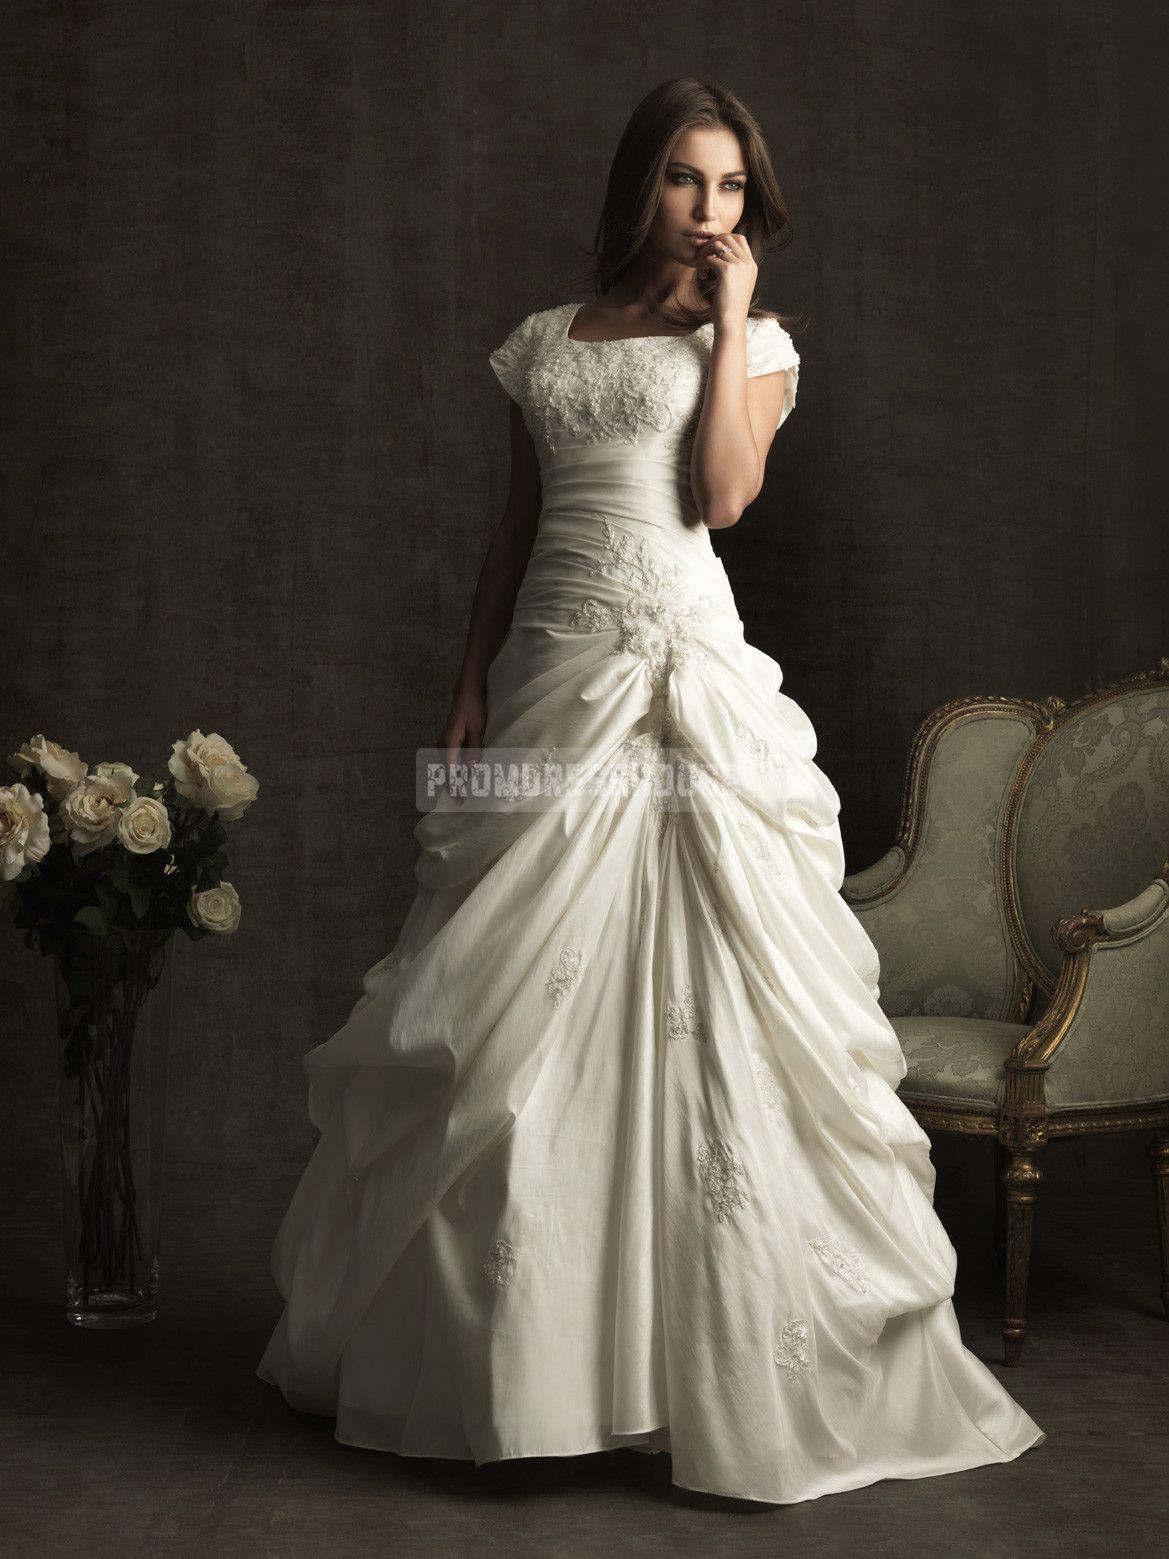 Conservative wedding dresses  Chapel Train Short Sleeve Draping Scoop Embroidery Wedding Dress